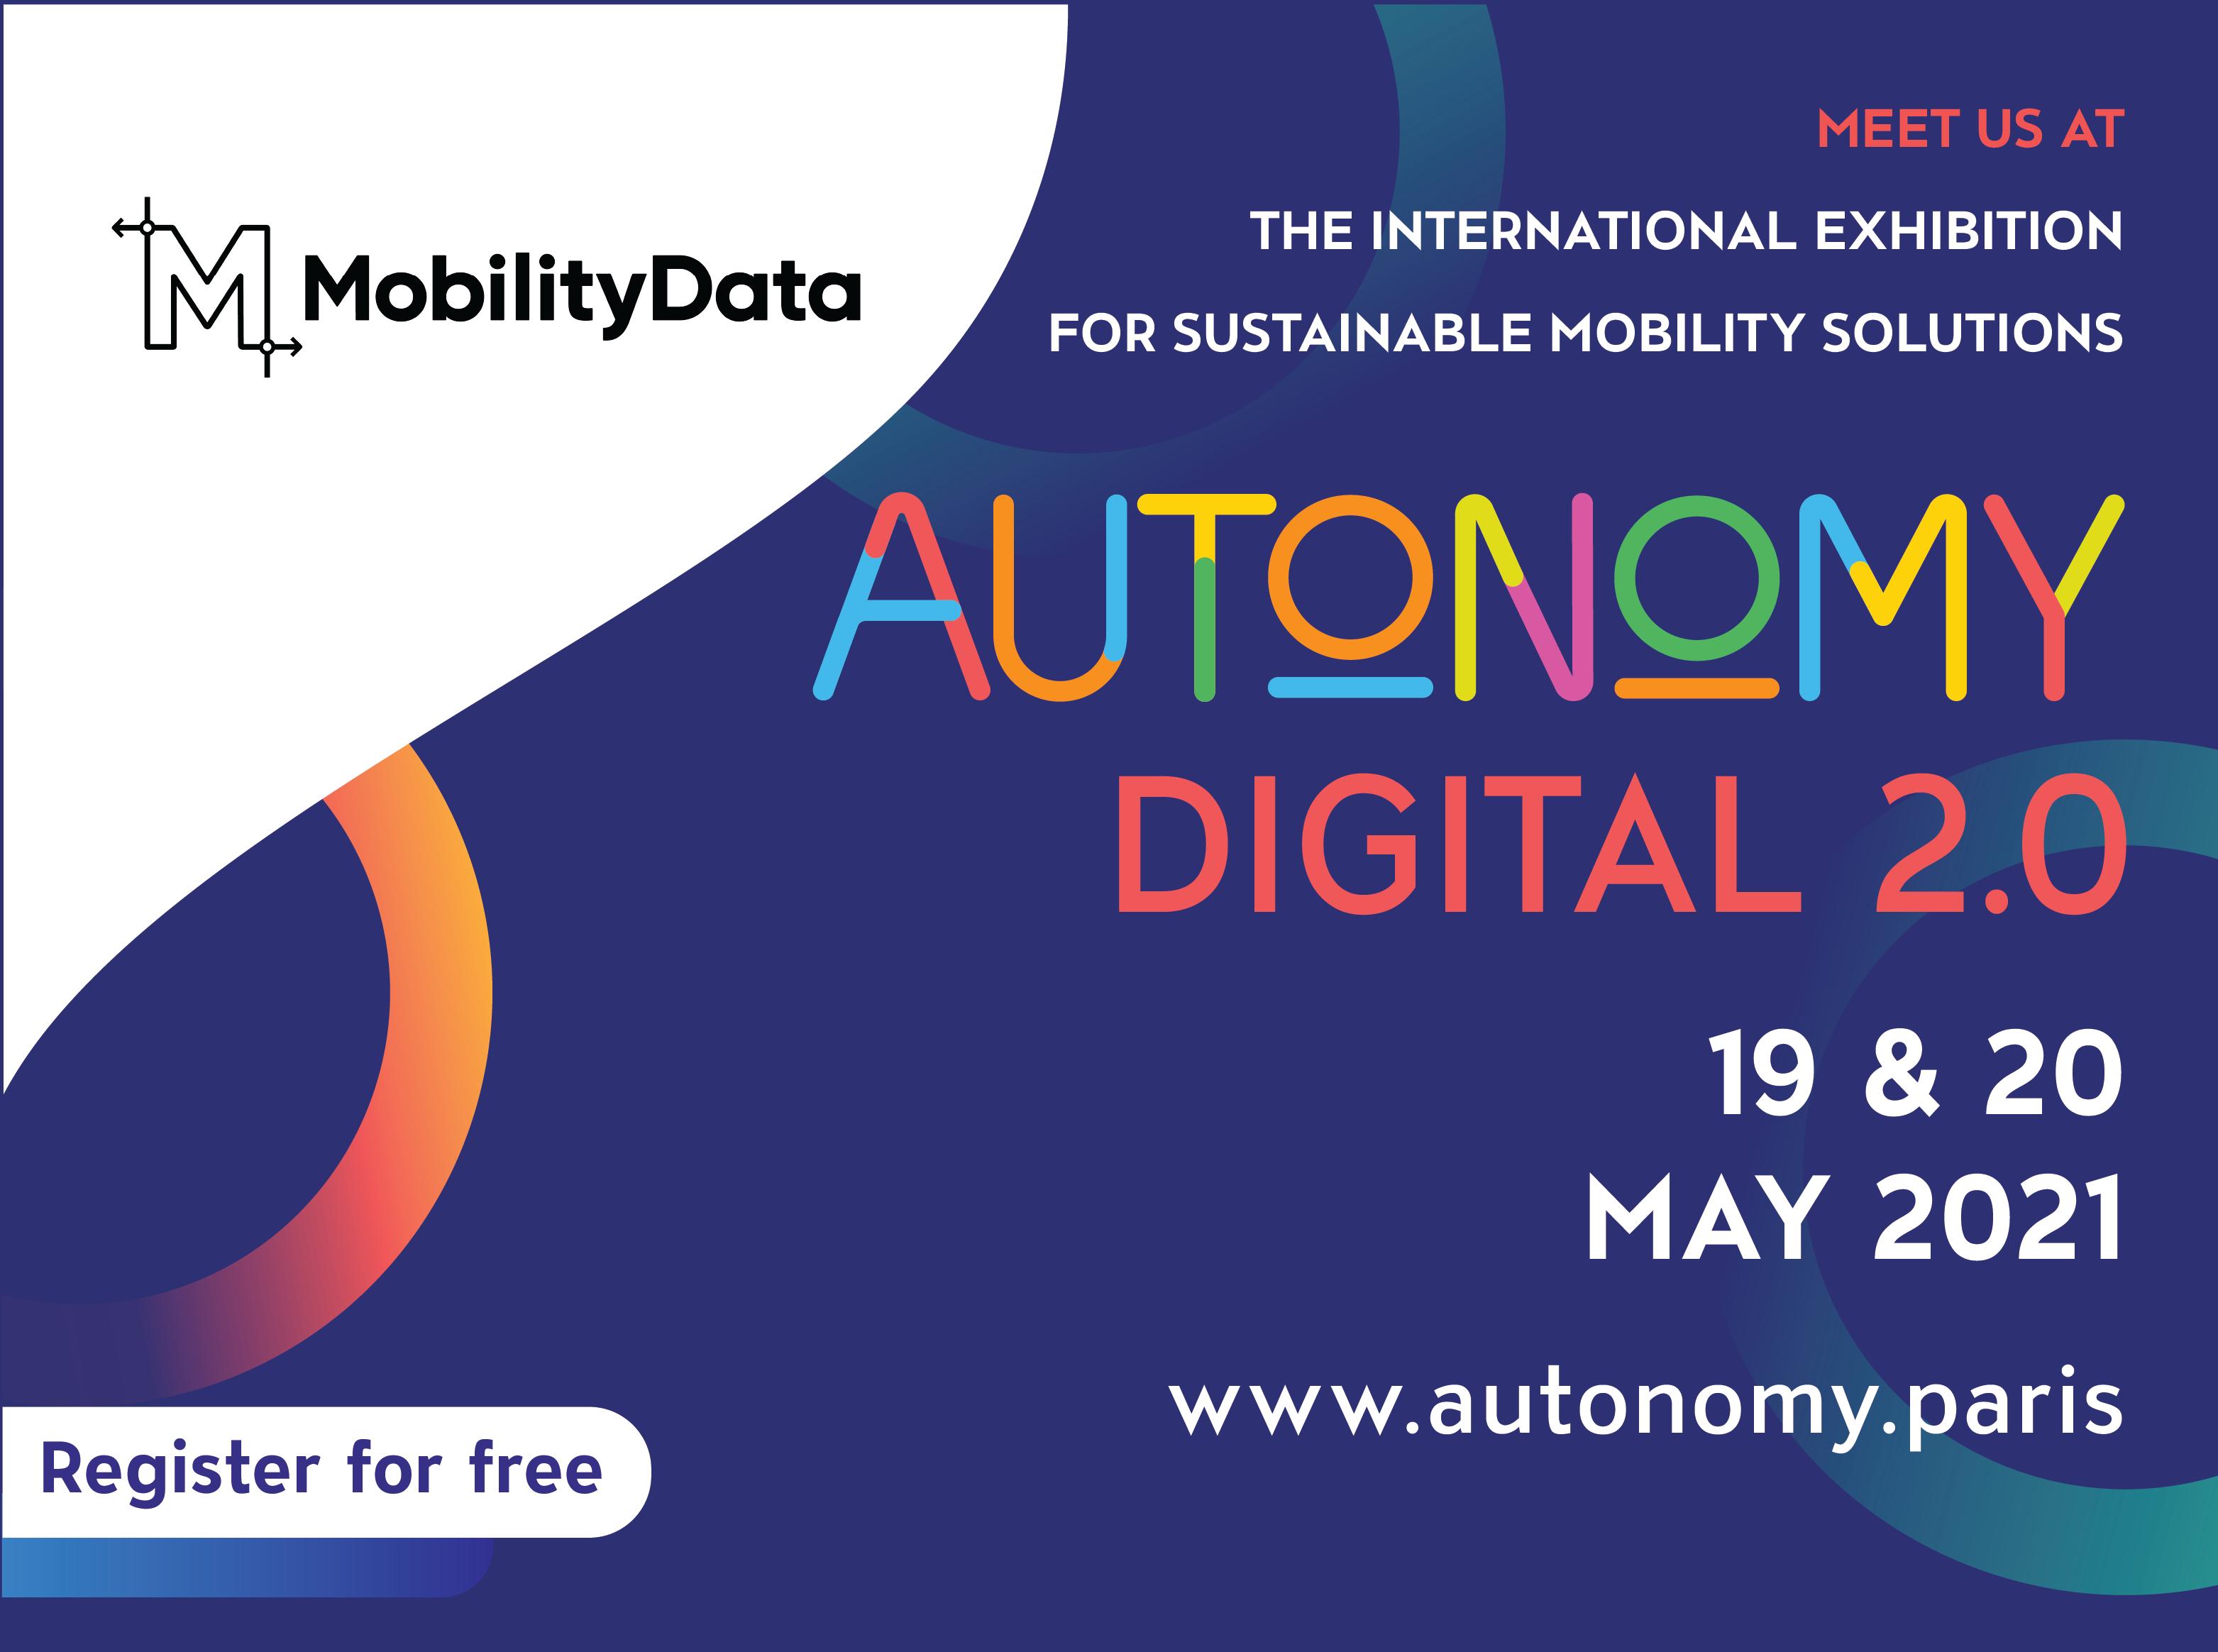 Autonomy Digital & MobilityData